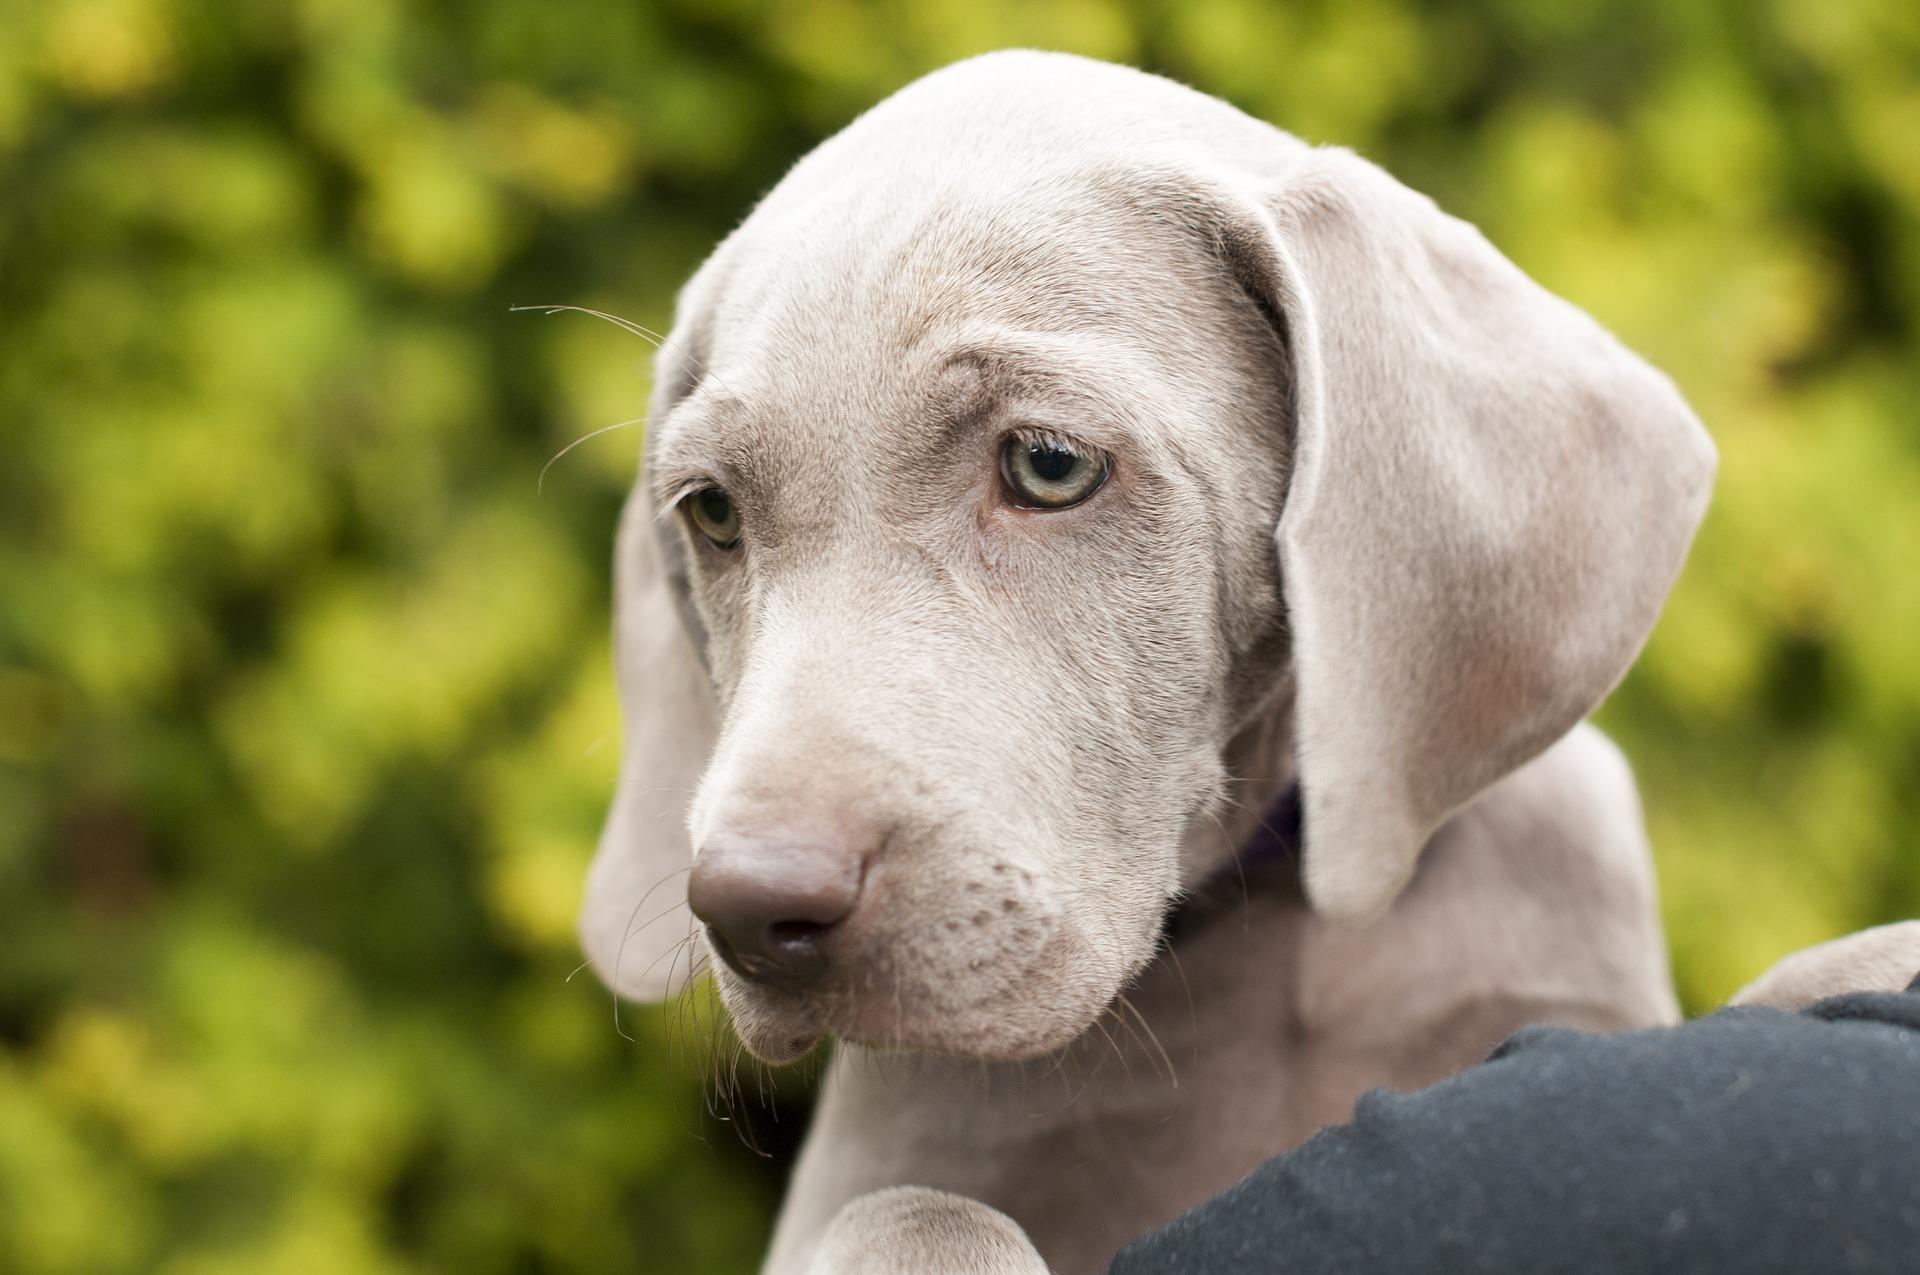 Auch Hundewelpen müssen regelmäßig entwurmt werden